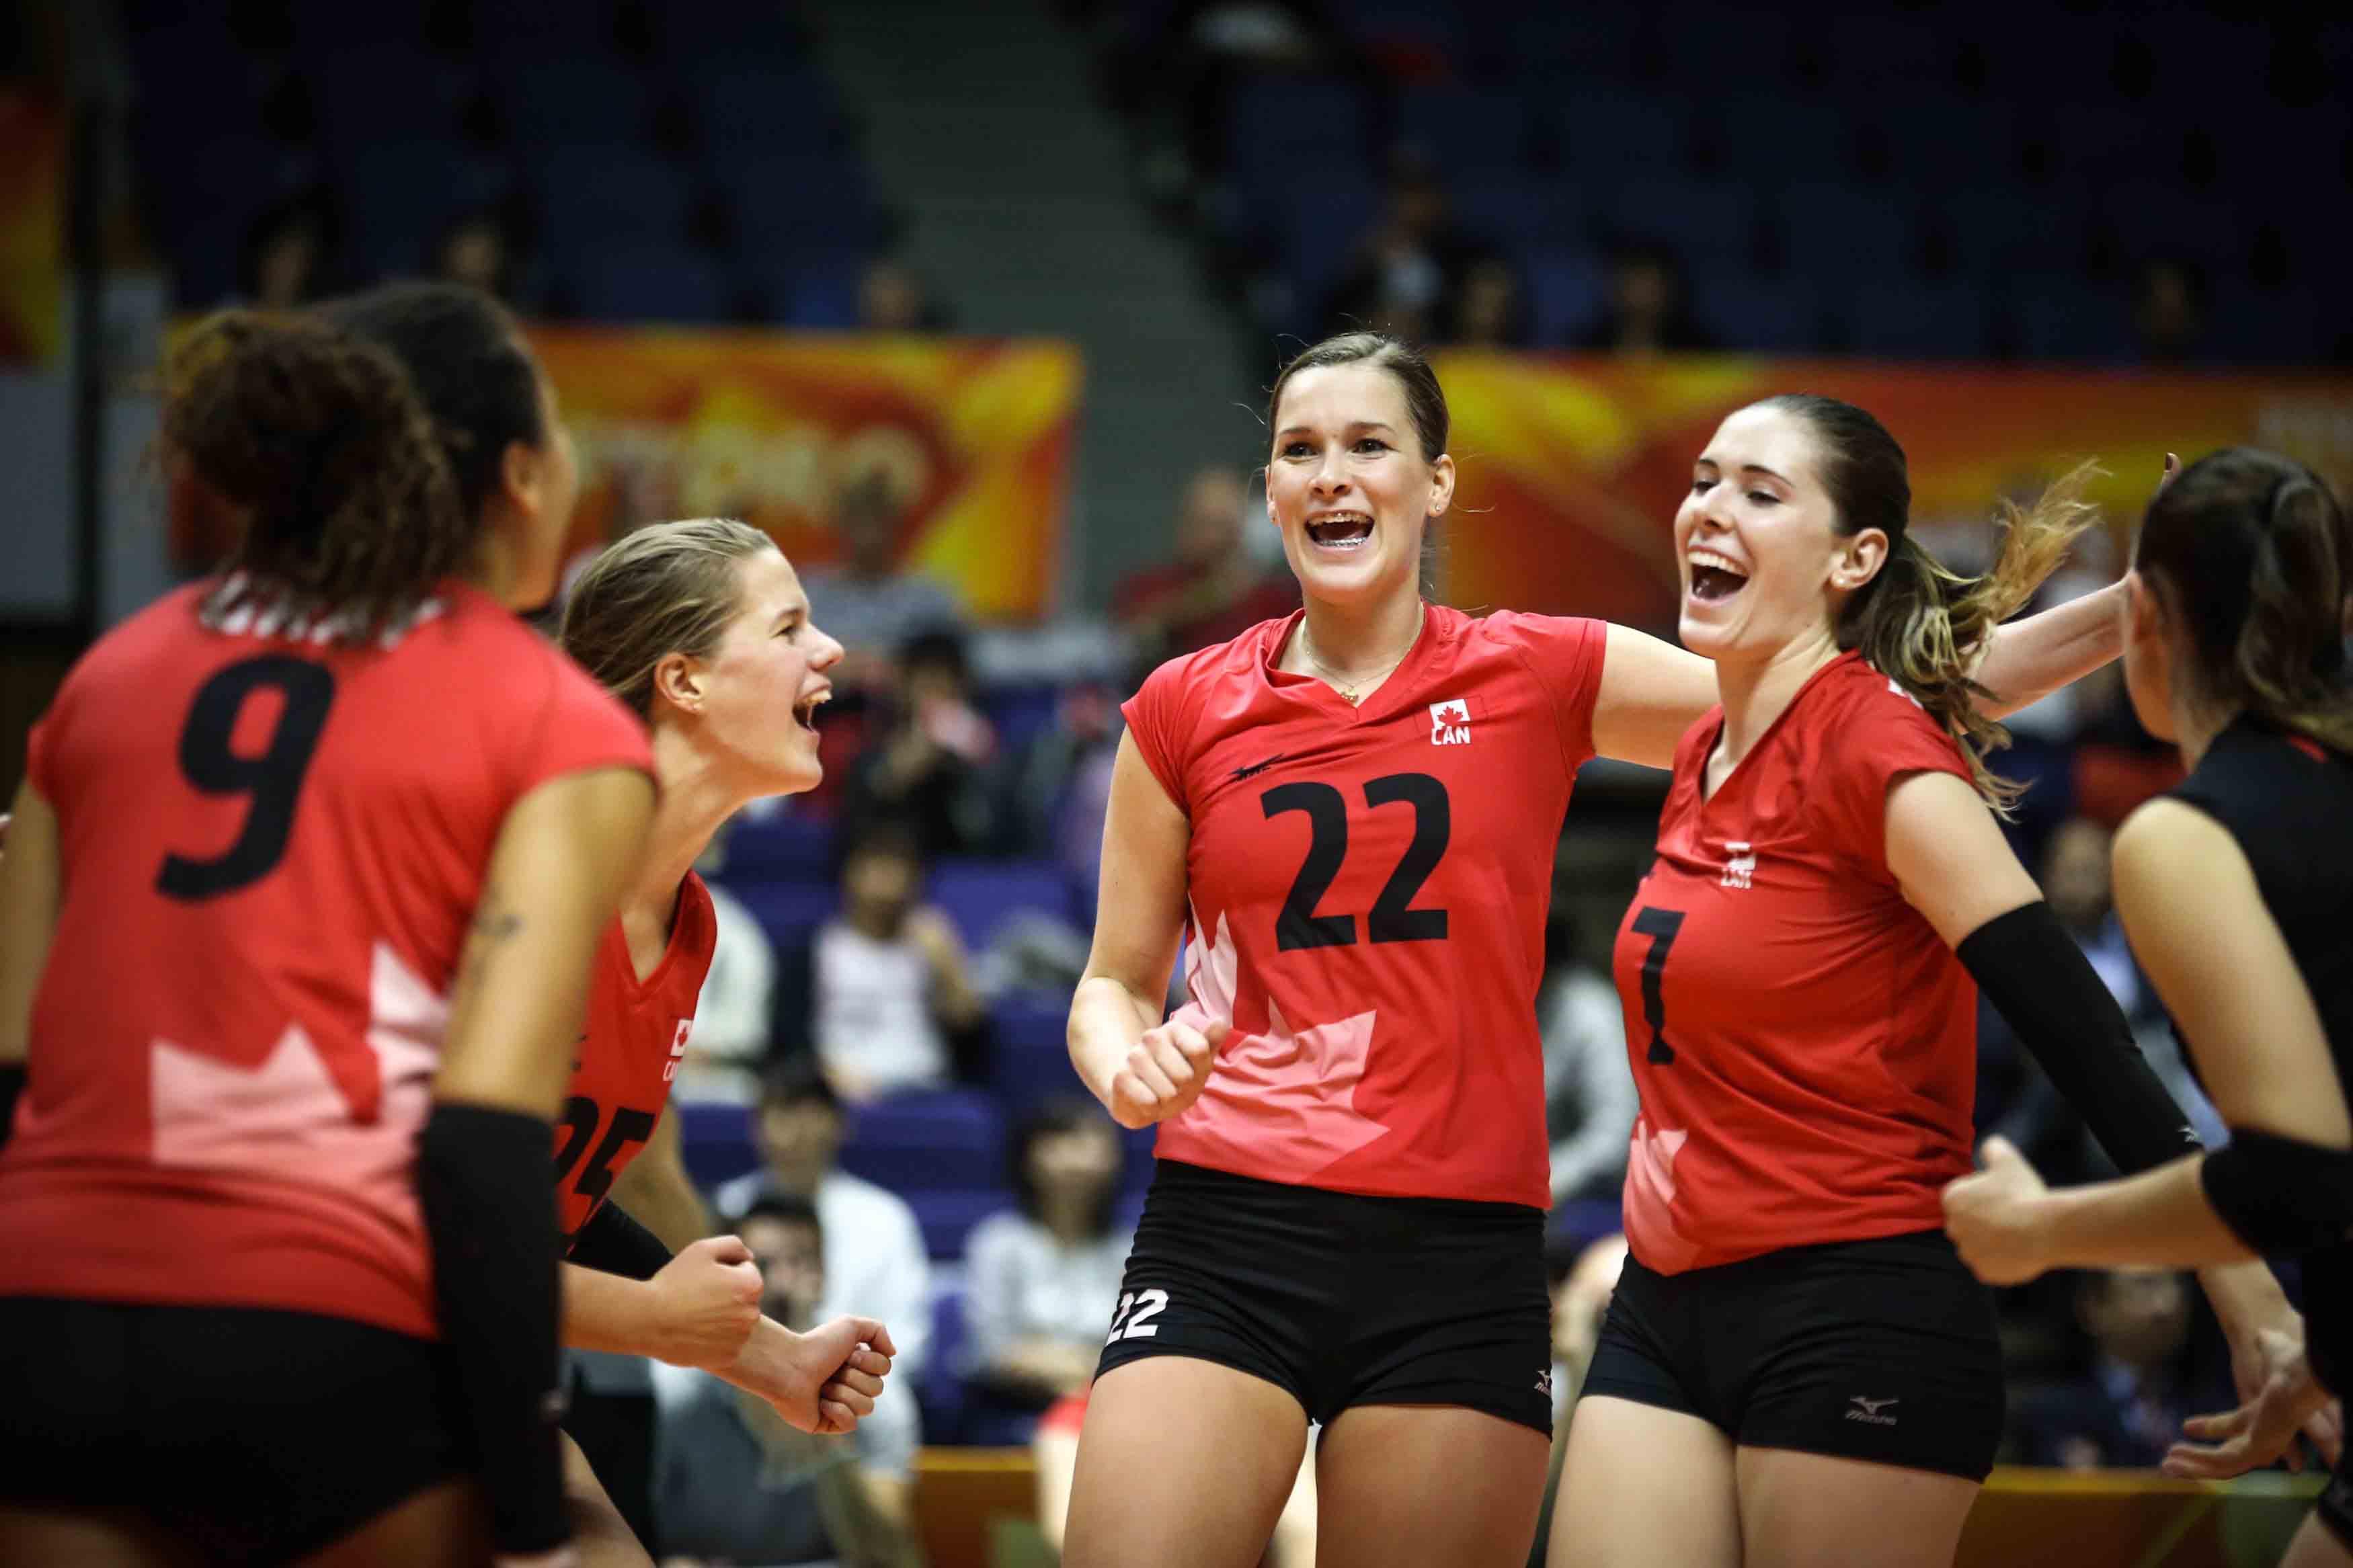 Megan Cyr celebrating a point with teammates.